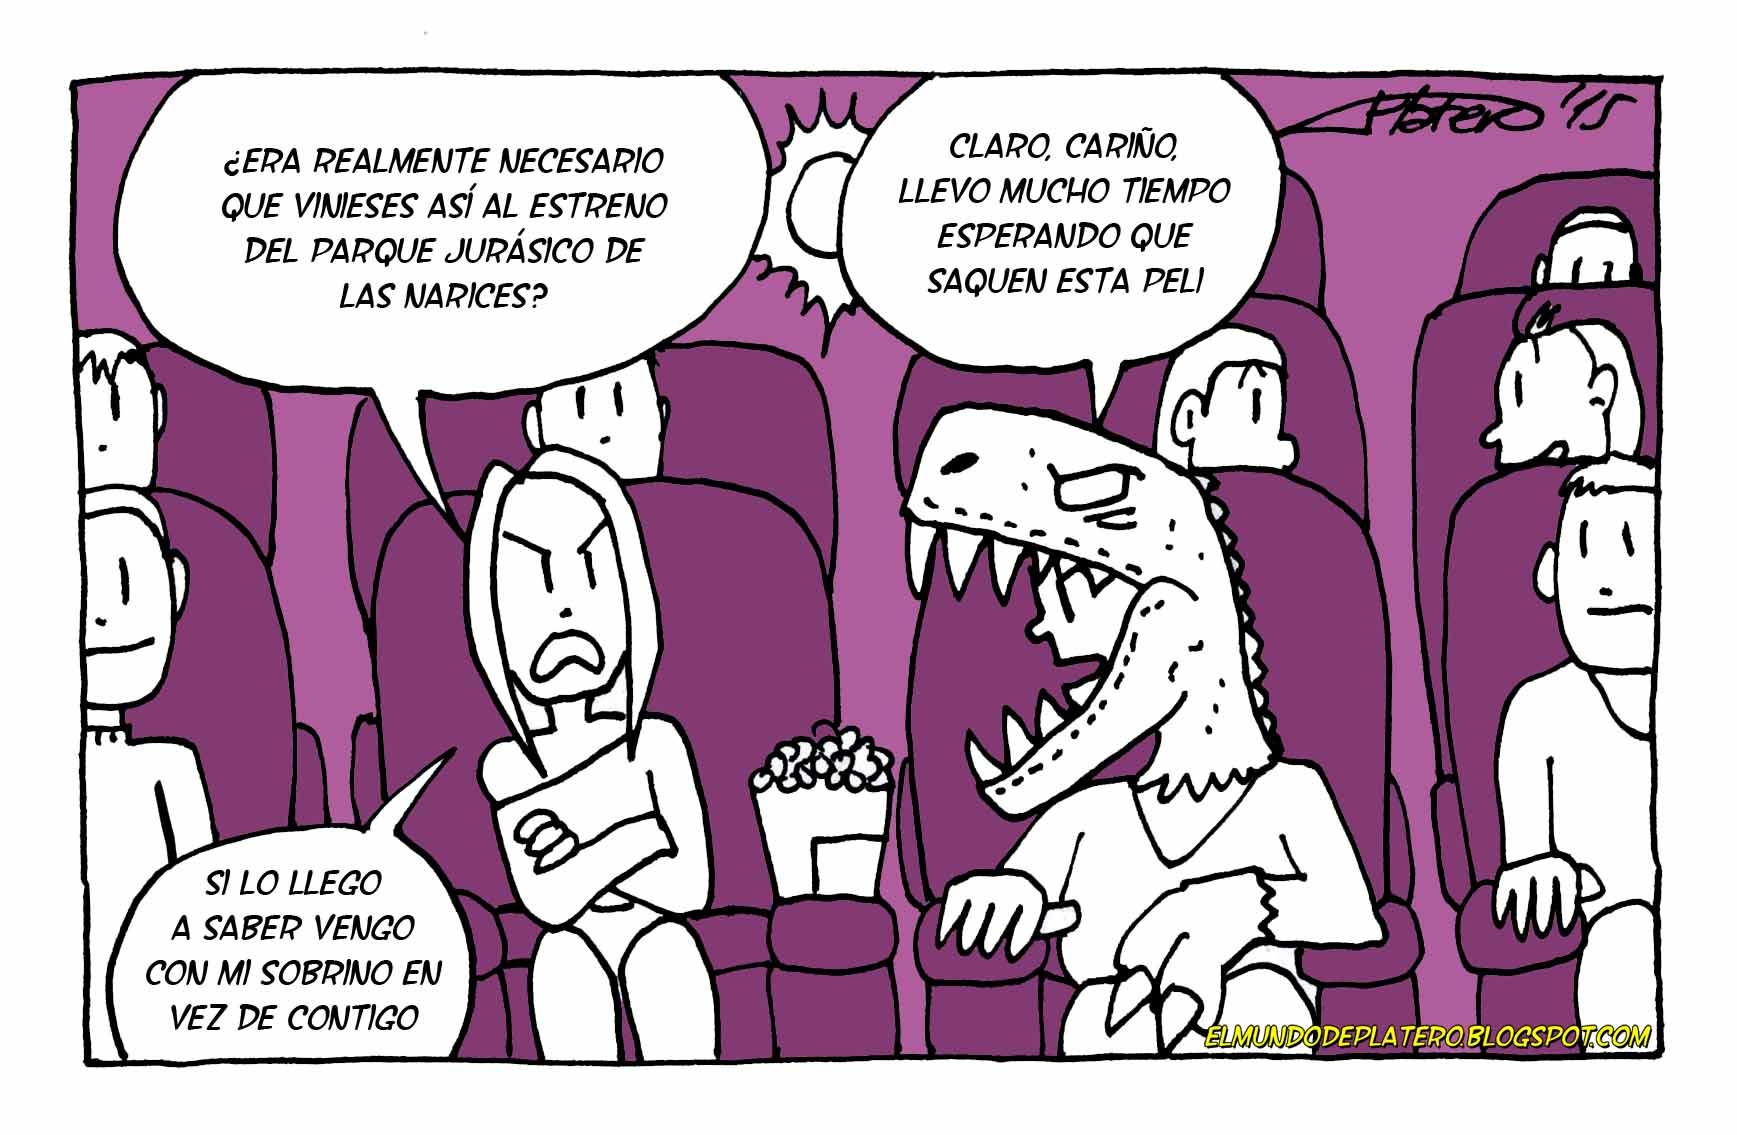 jurassic_world_dinosaurios_steven_spielberg_cine_cómic_josé_luis_platero_elmundo